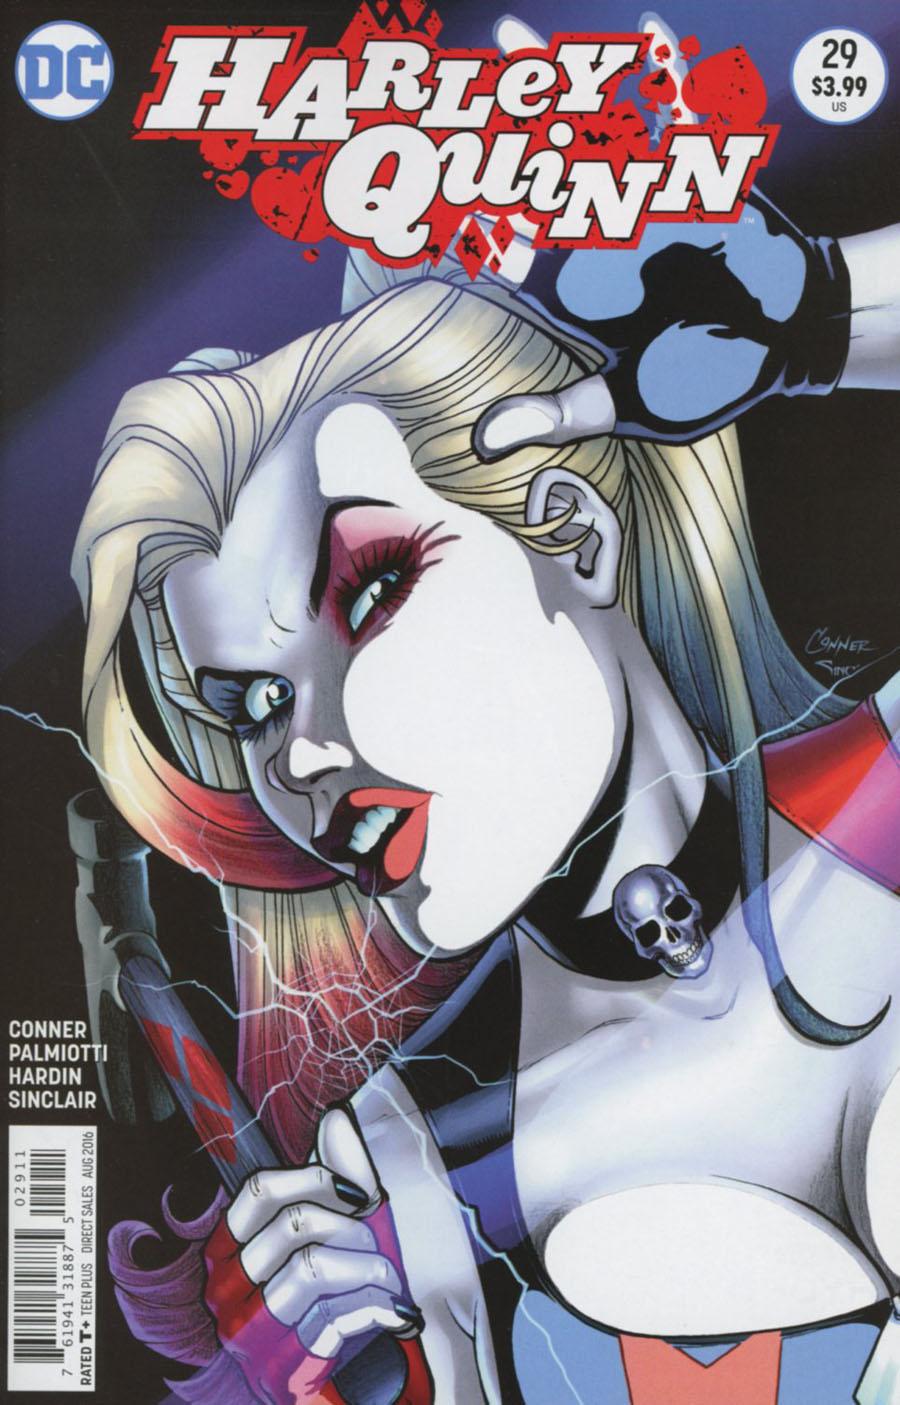 Harley Quinn Vol 2 #29 Cover A Regular Amanda Conner Cover